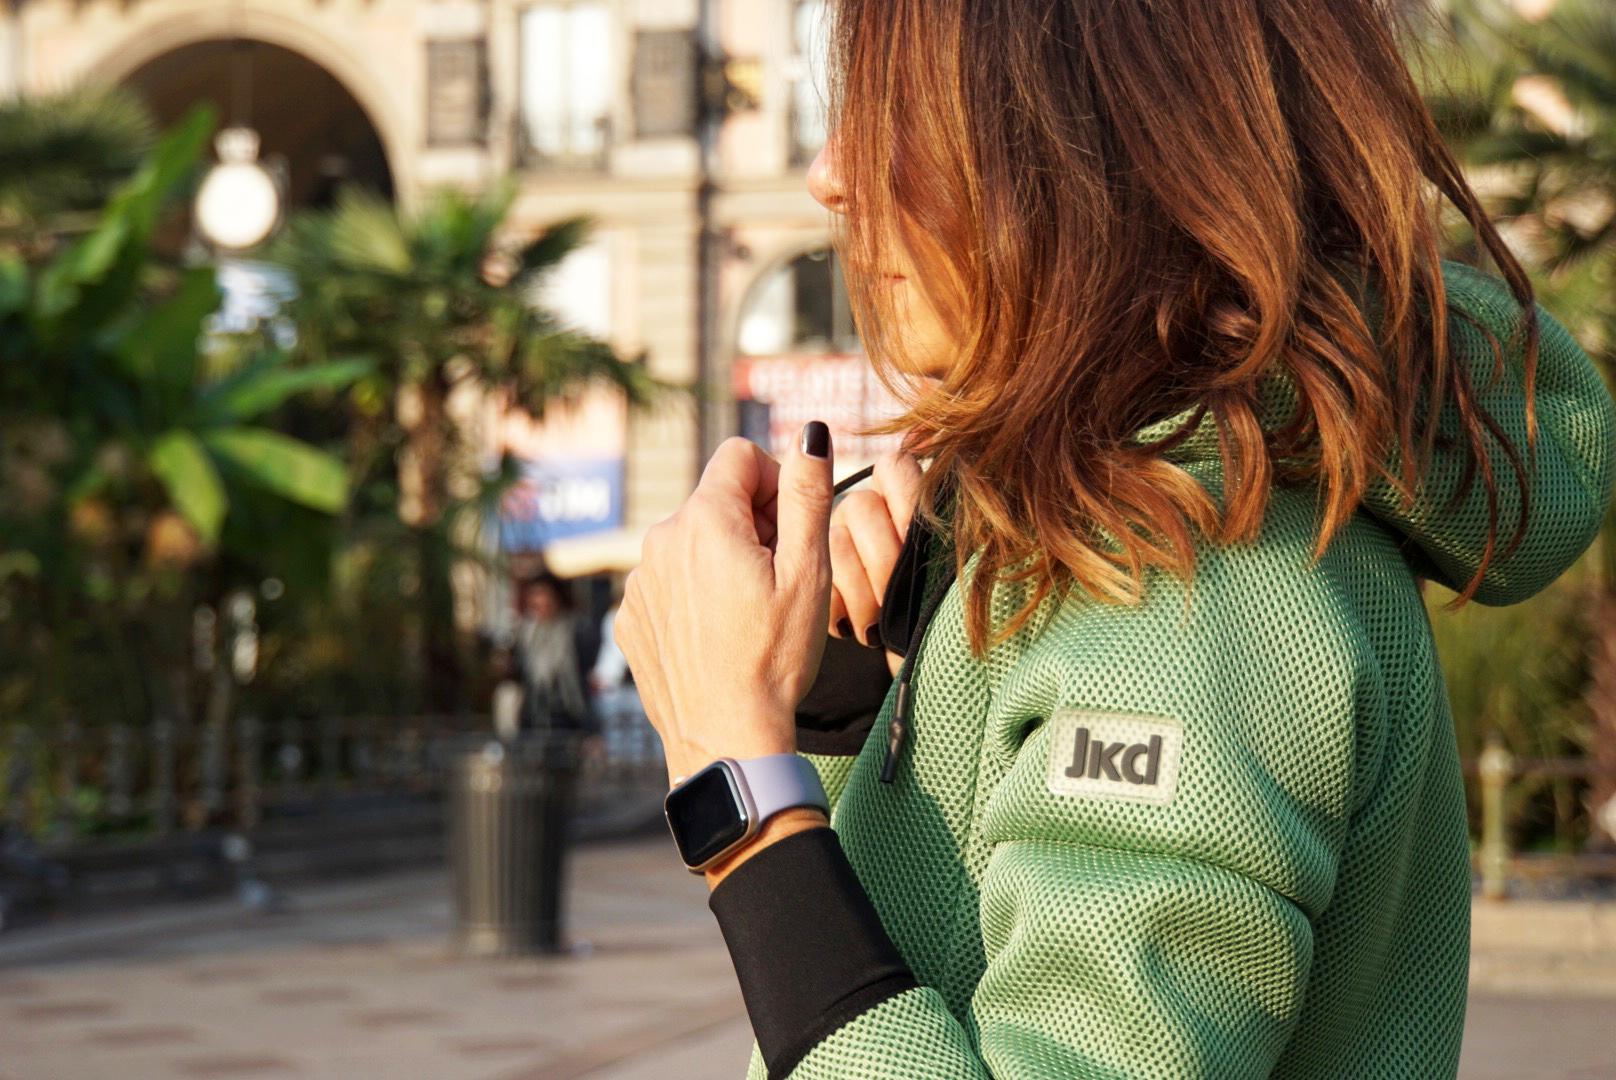 Apple Watch Series 4, stupiscimi ancora Run and the City